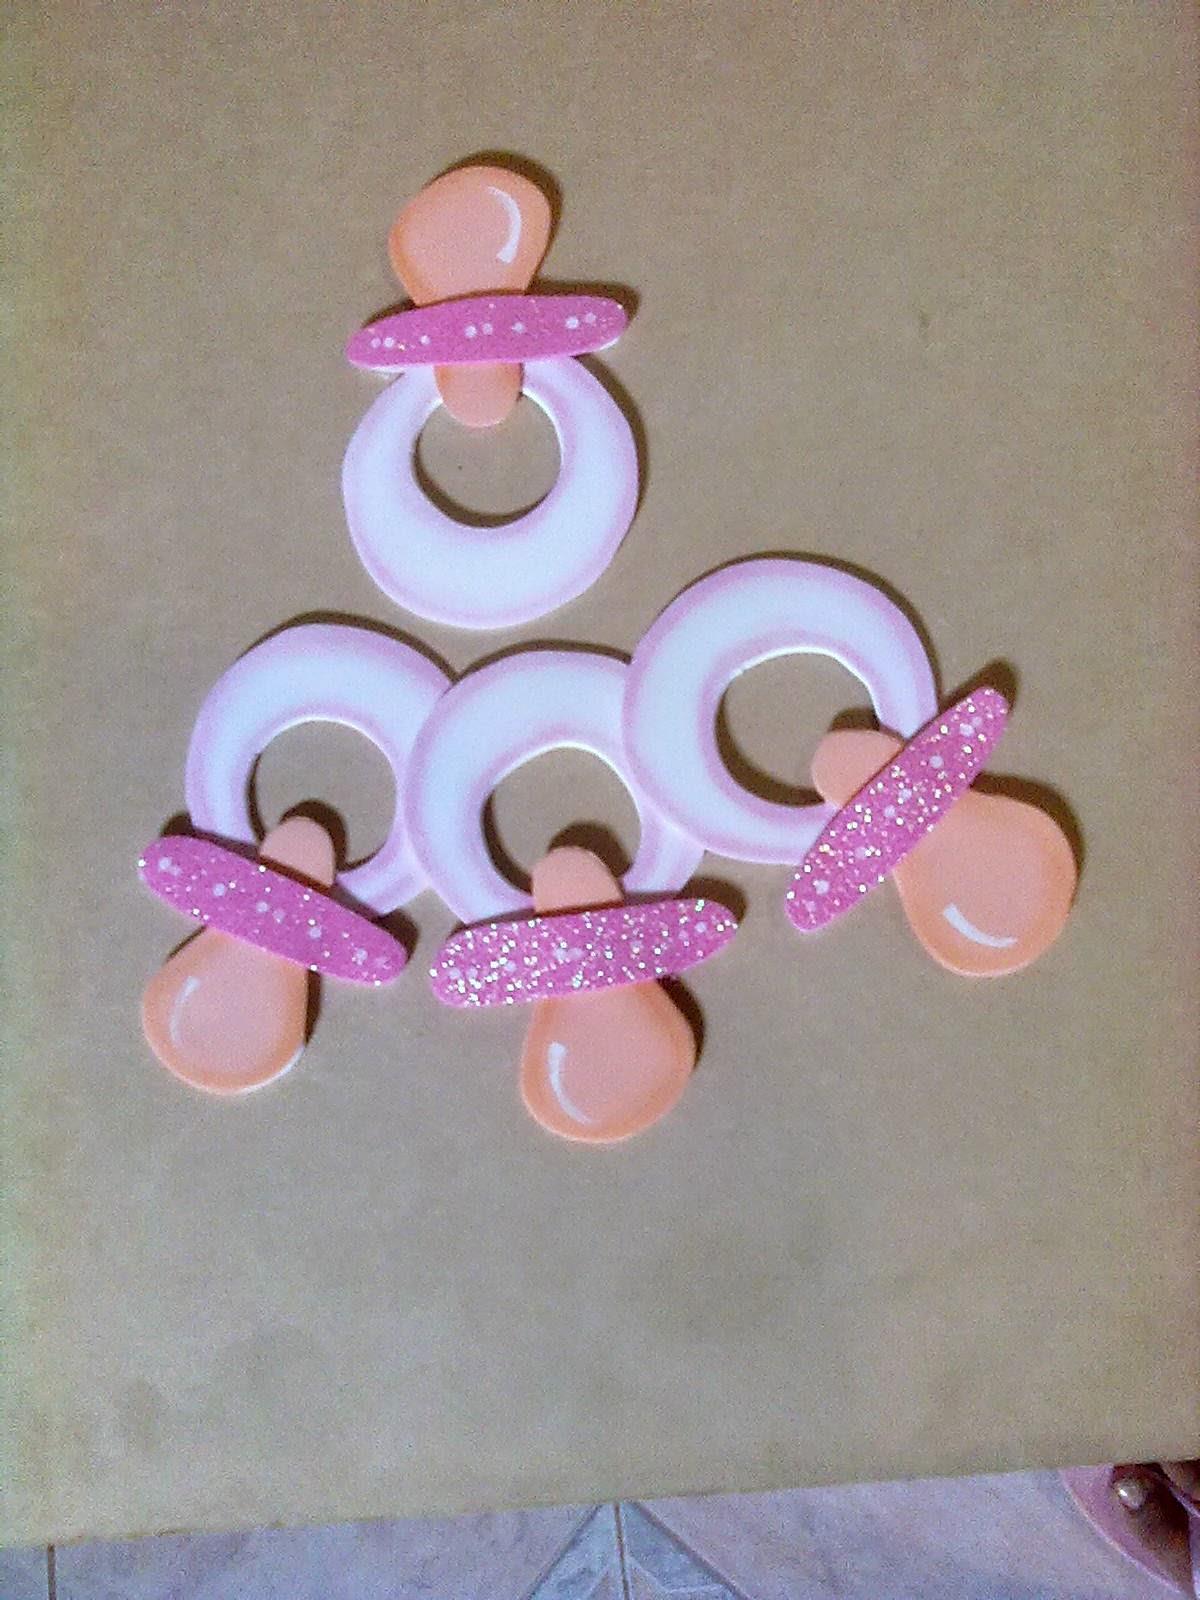 Crearte de mary detalles baby shower fomix - Detalles para baby shower ...